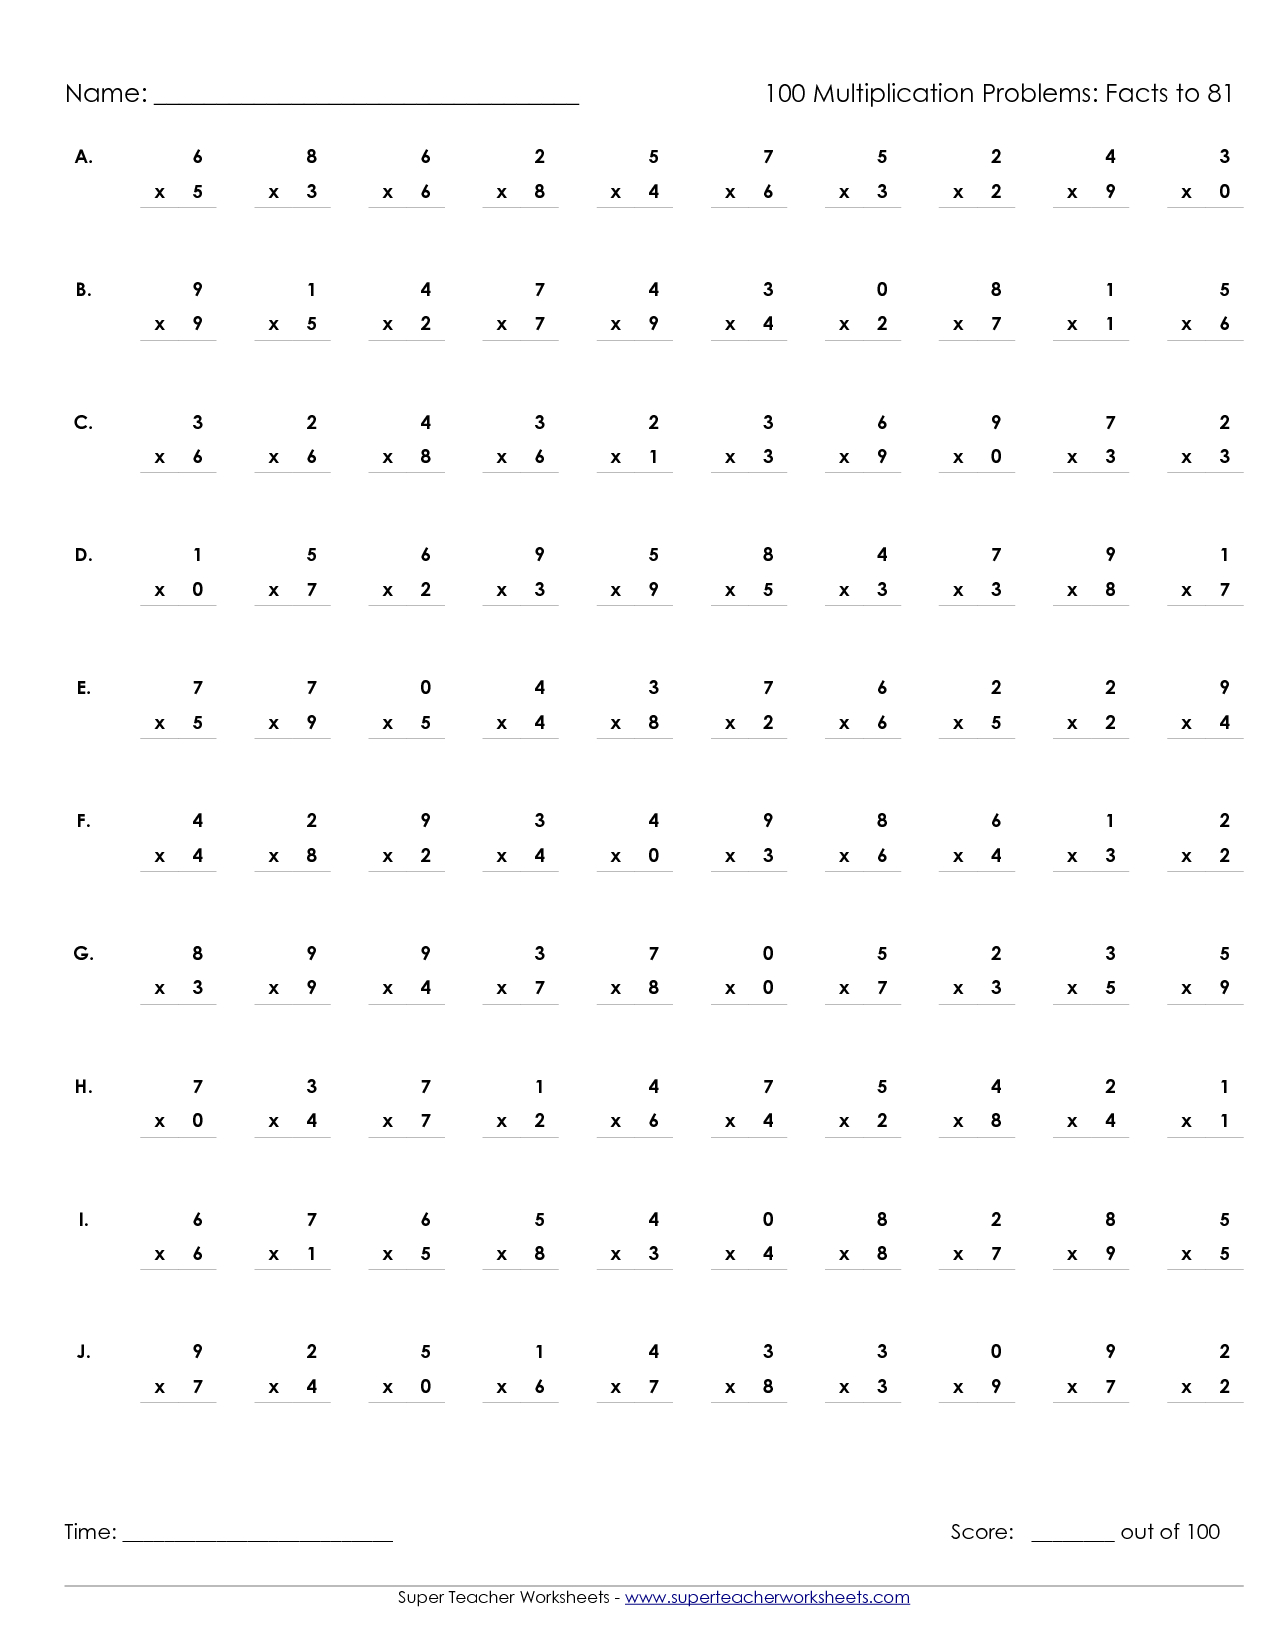 Printable Multiplication Worksheets 100 Problems within Multiplication Worksheets 5Th Grade 100 Problems